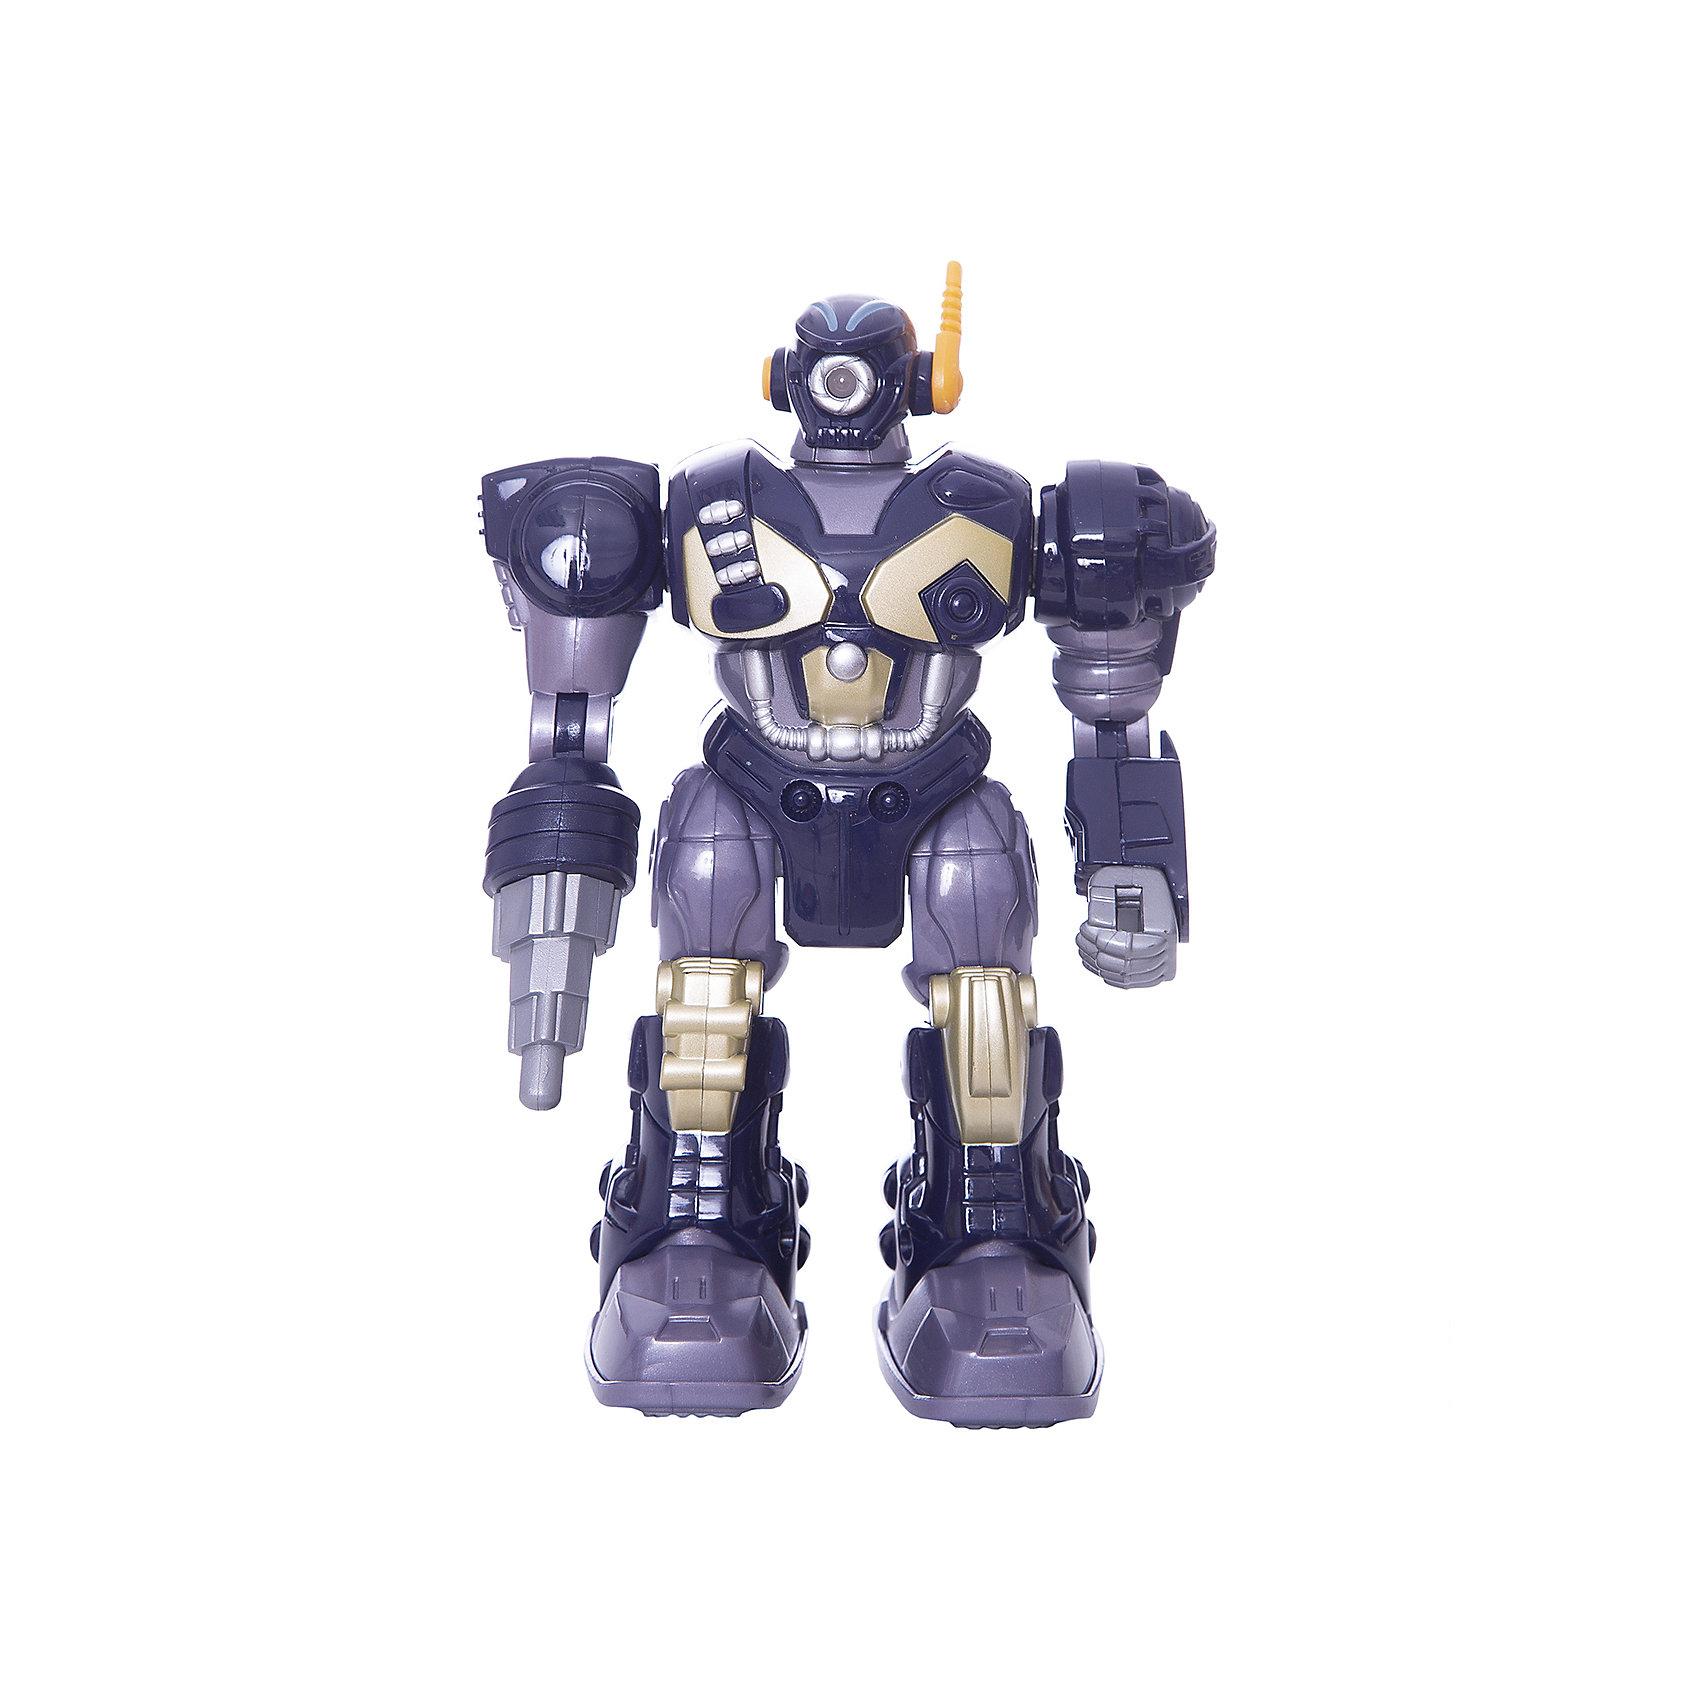 HAP-P-KID Робот Polar Captain, 17,5 см, HAP-P-KID роботы hap p kid робот polar captain